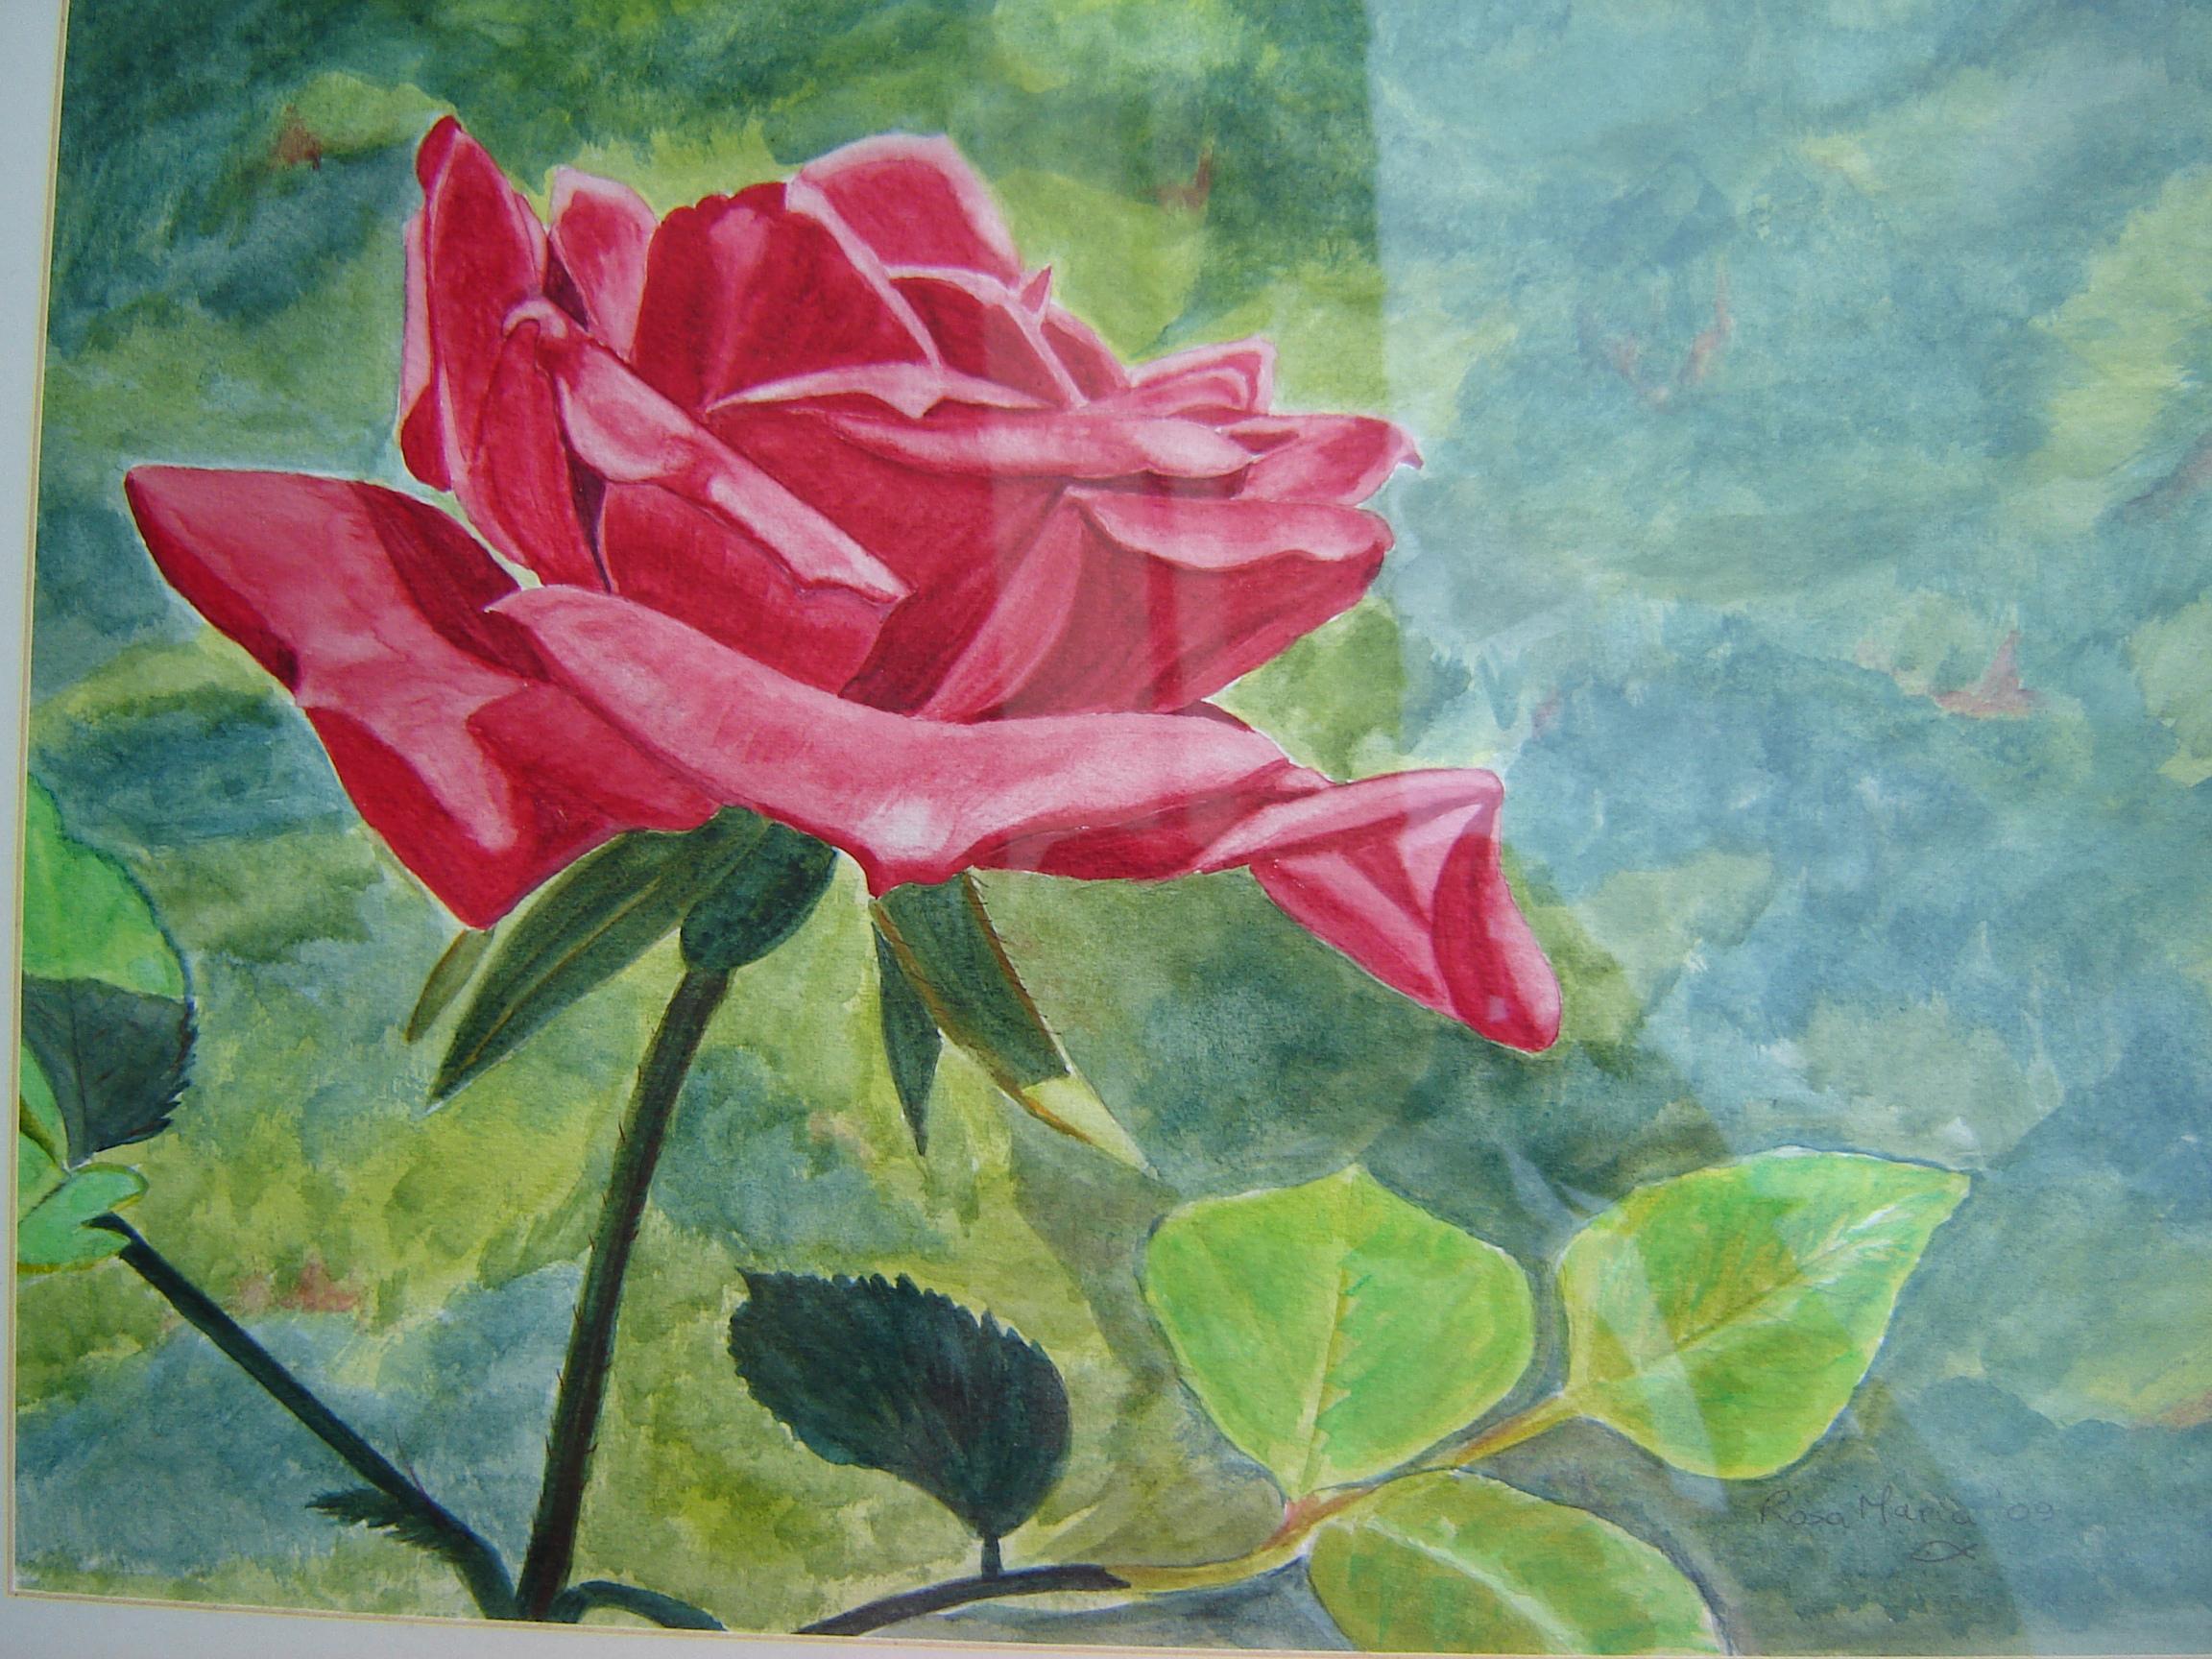 Rose in garden (Rosa vermelha no jardim